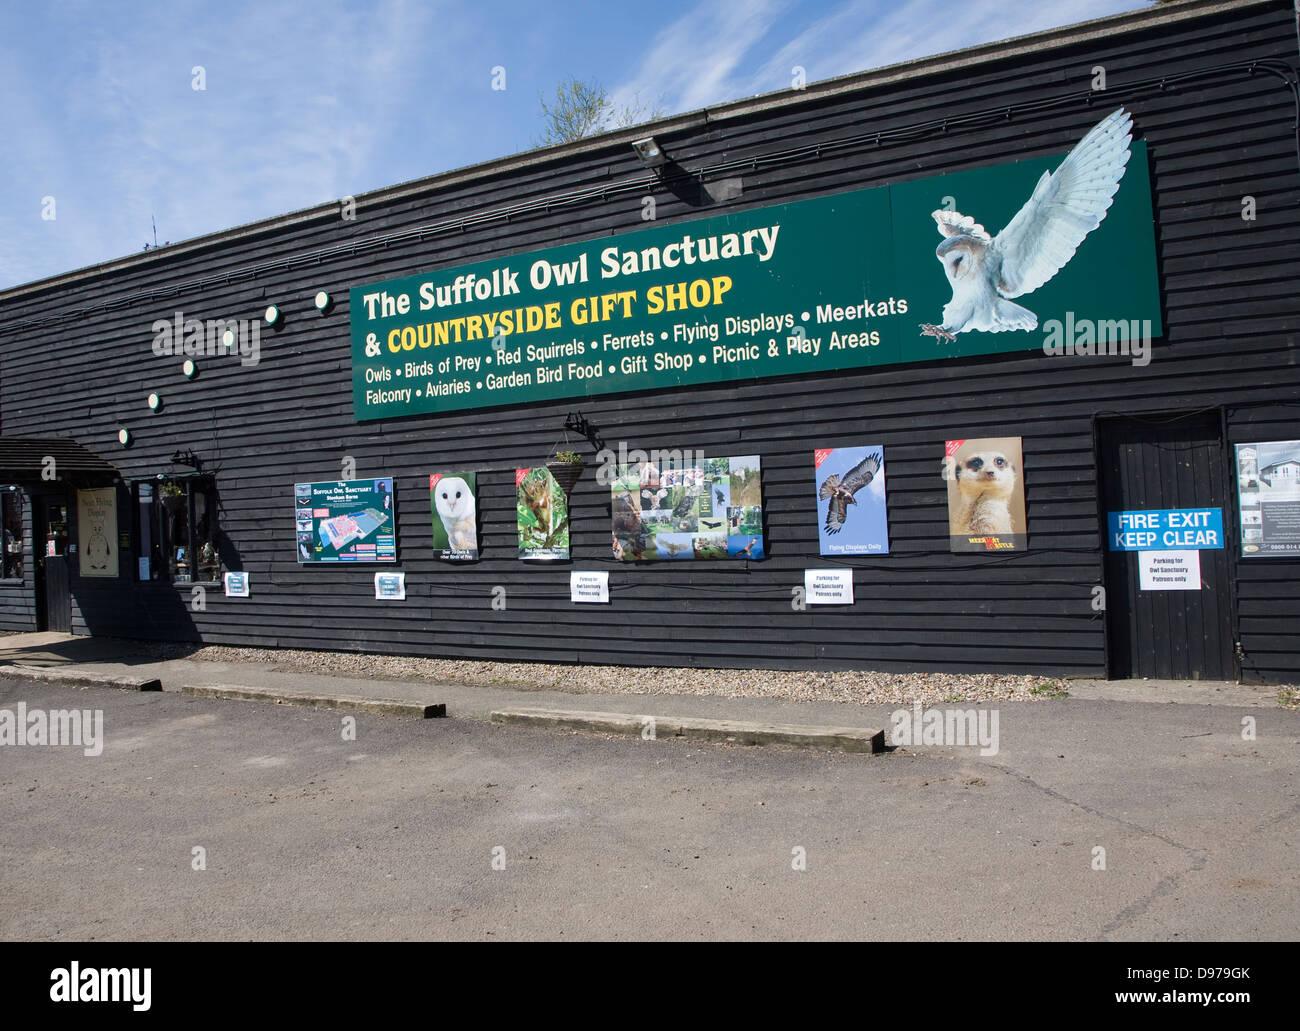 The Suffolk Owl Sanctuary building, Stonham Barns, Suffolk, England - Stock Image